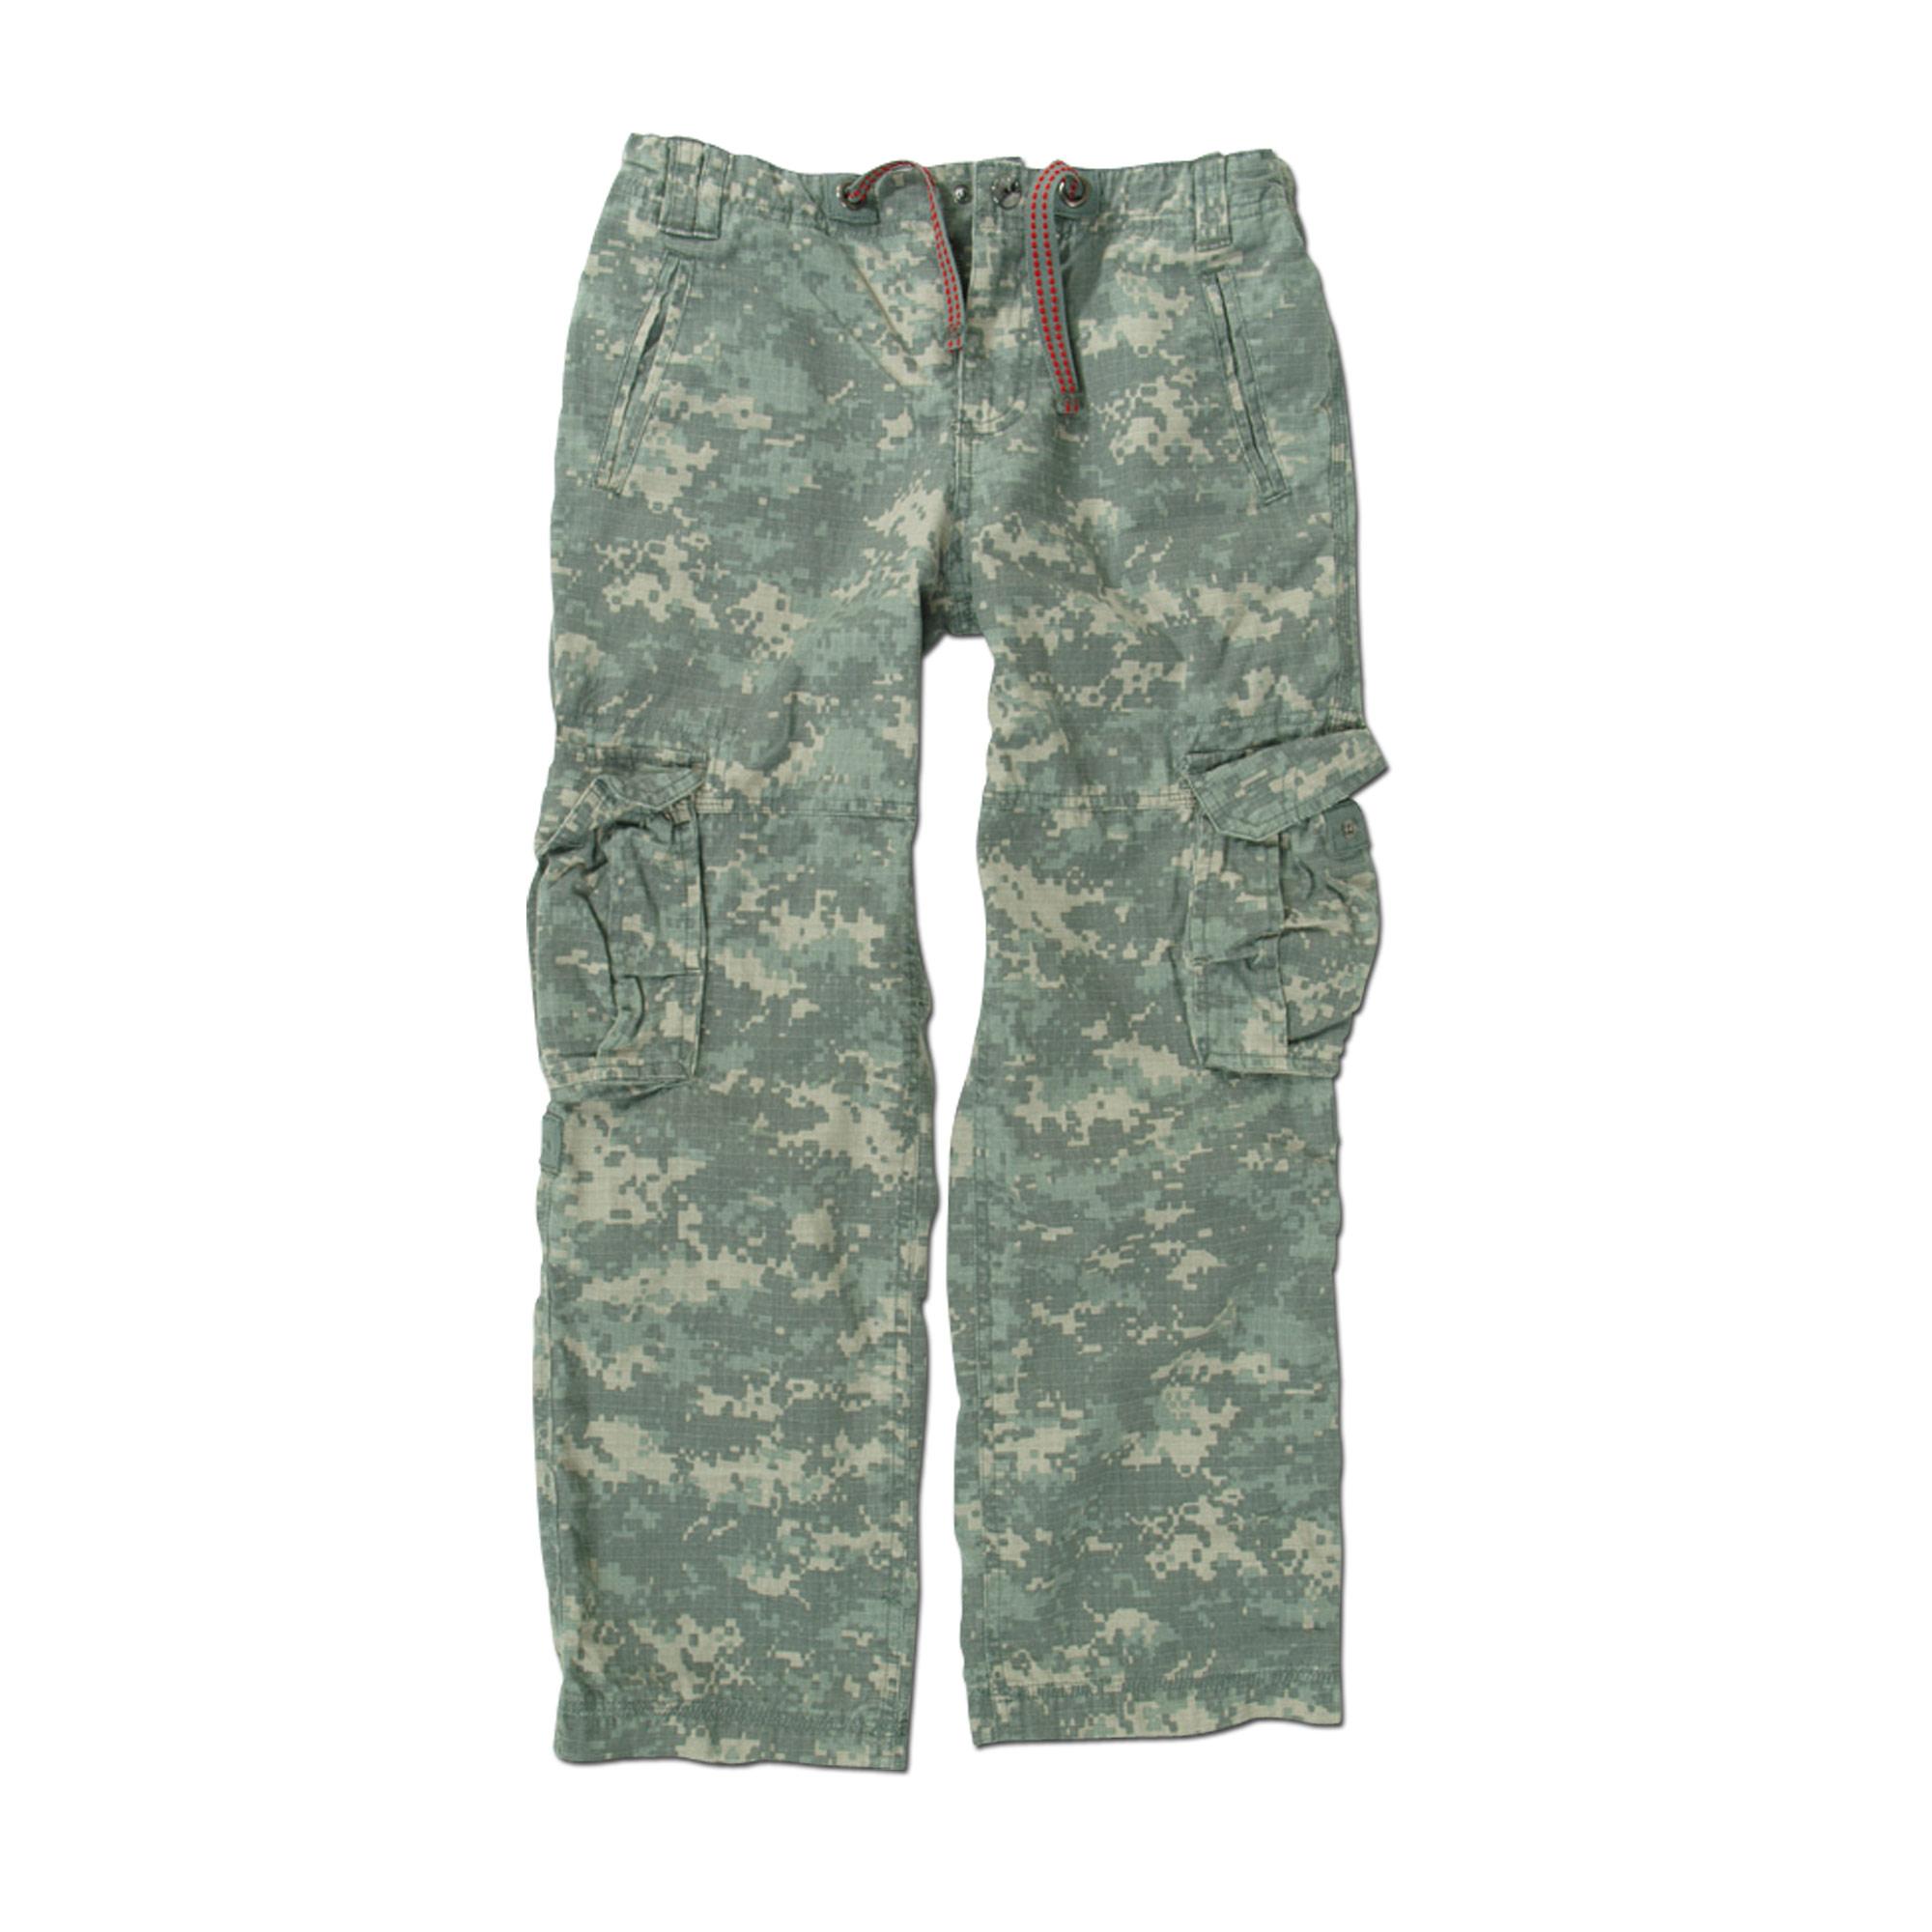 Pantalon Ranger enfant Mil-Tec AT-digital